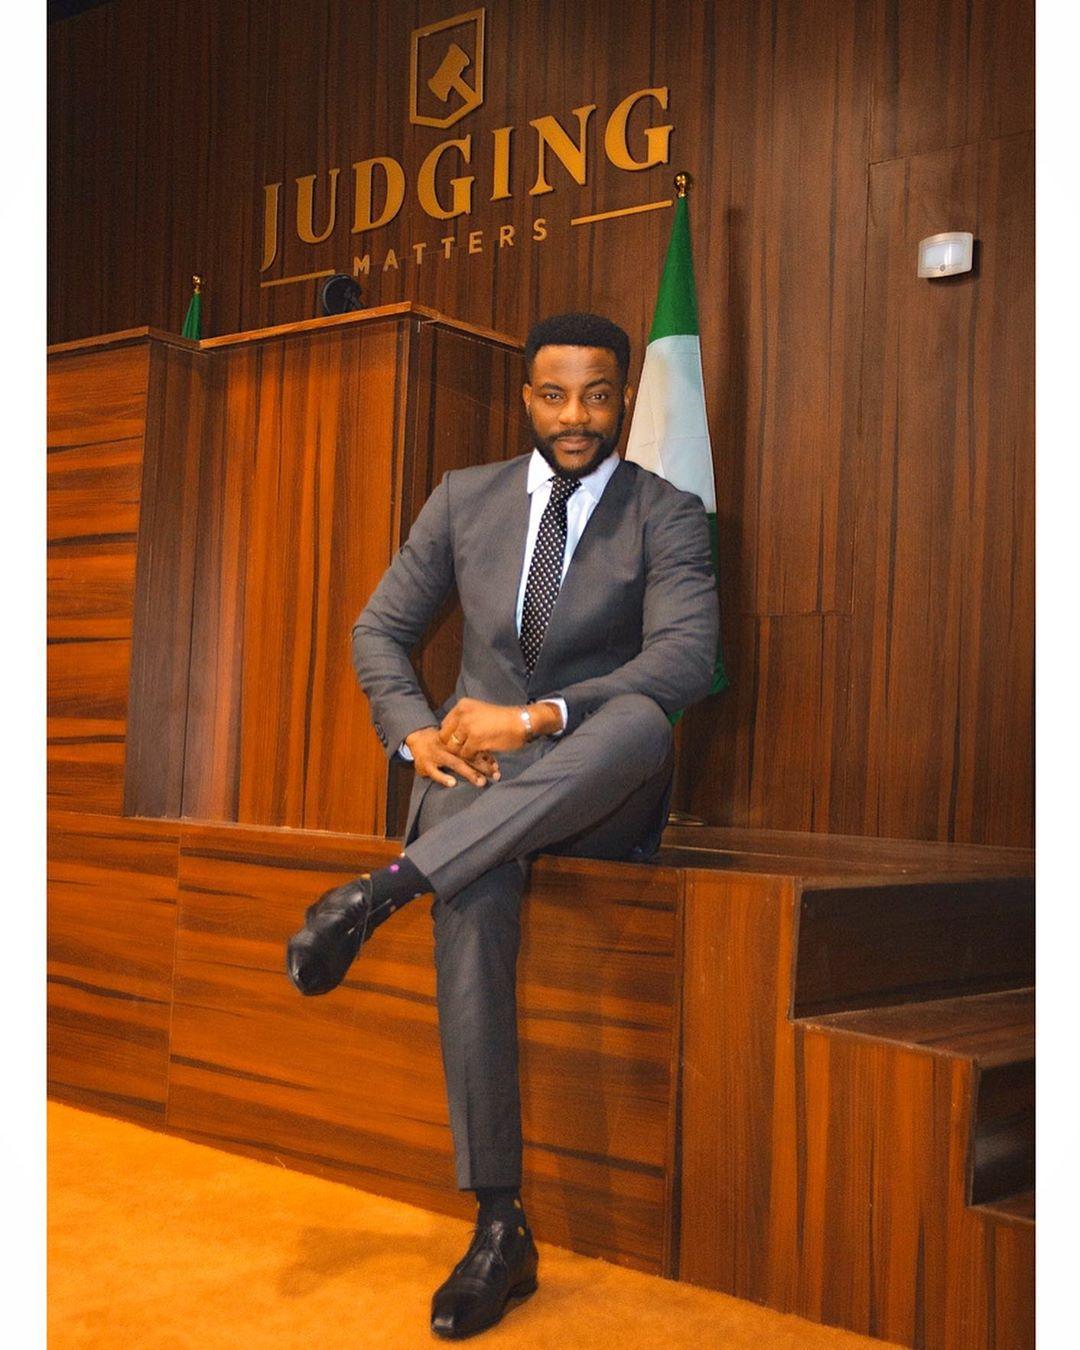 Ebuka Obi-Uchedu's new reality show 'Judging Matters' will showcase real court cases [Instagram/ebuka]